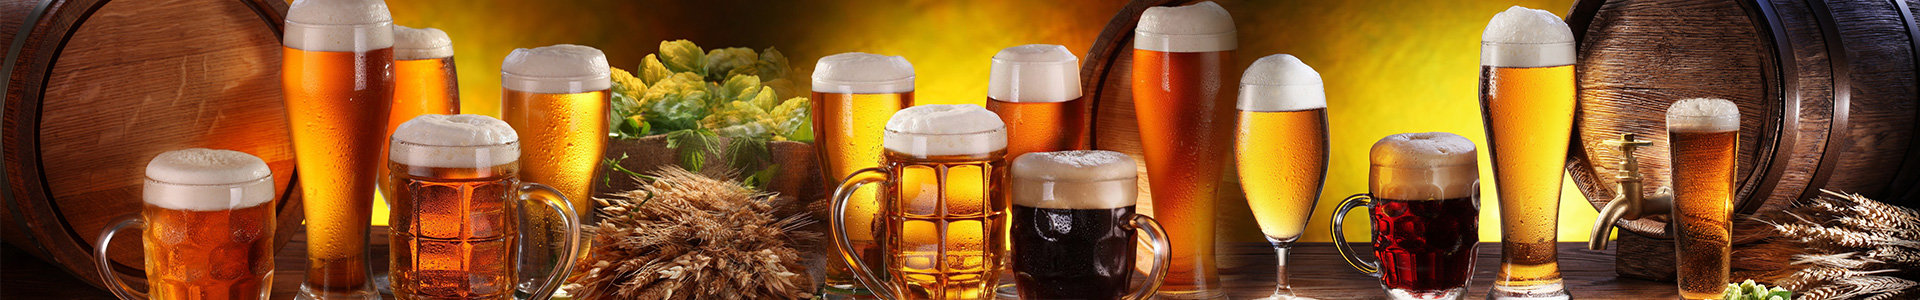 Клуб любителей холодного пива